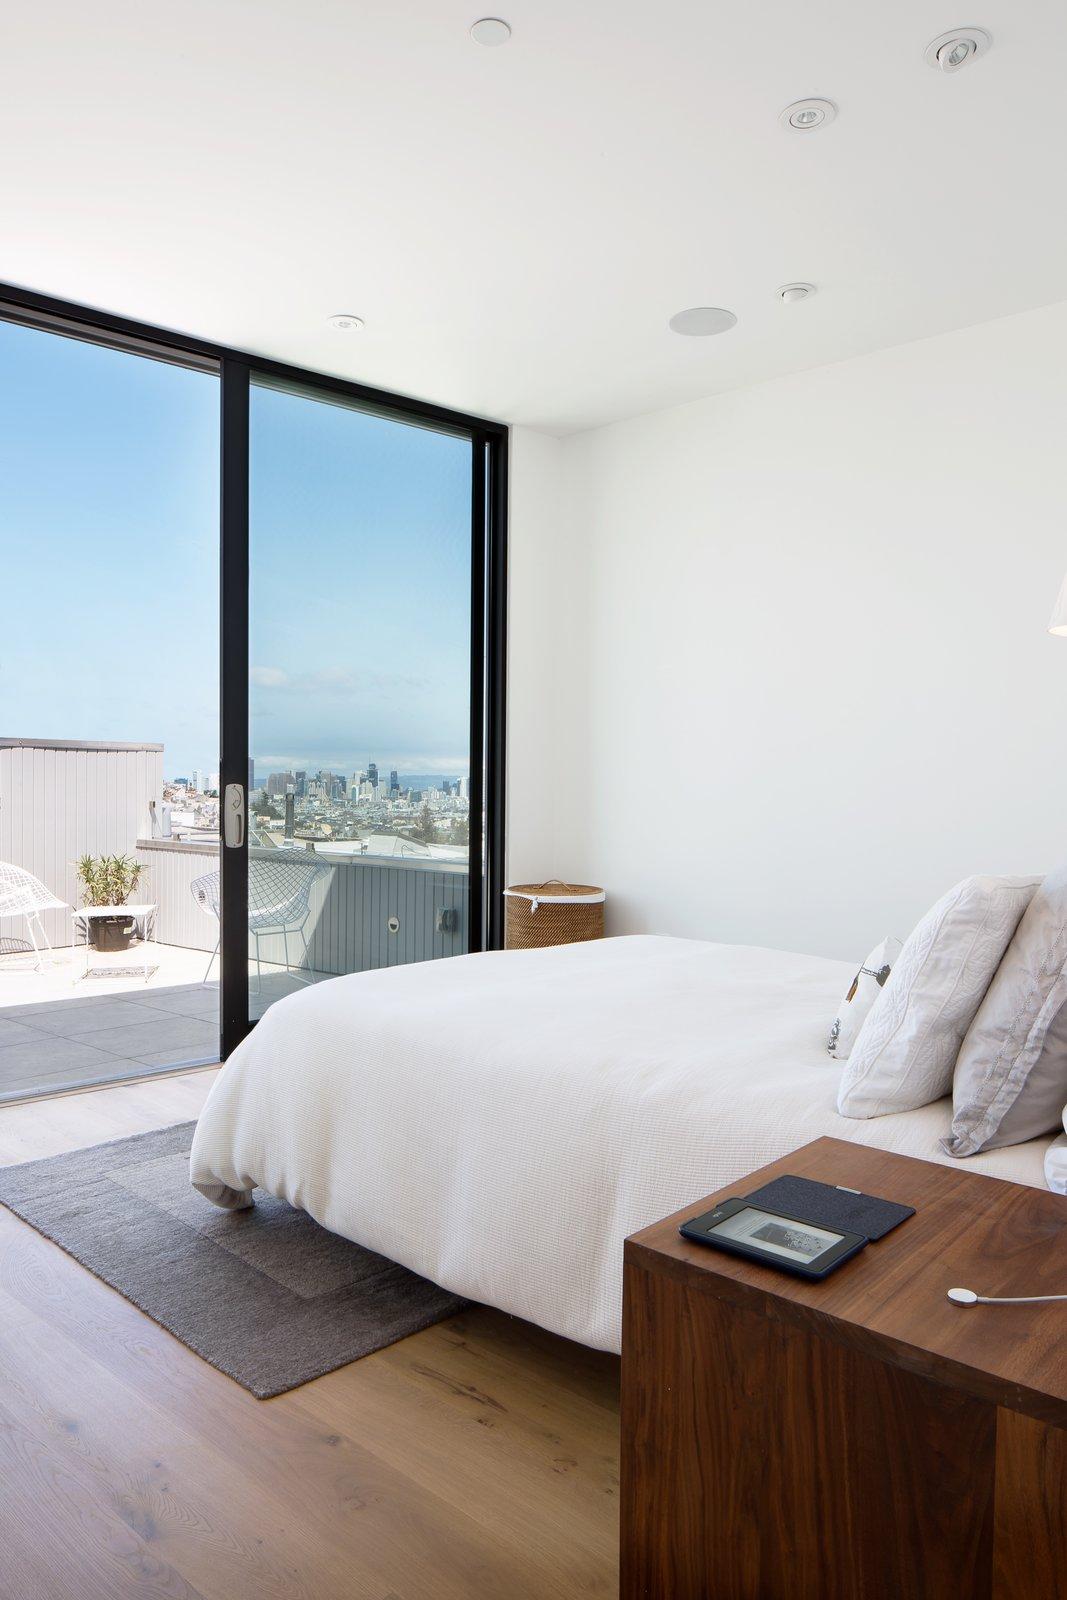 Bedroom, Bed, and Medium Hardwood Floor Master bedroom  27th Street - Noe Valley by patrick perez/designpad architecture